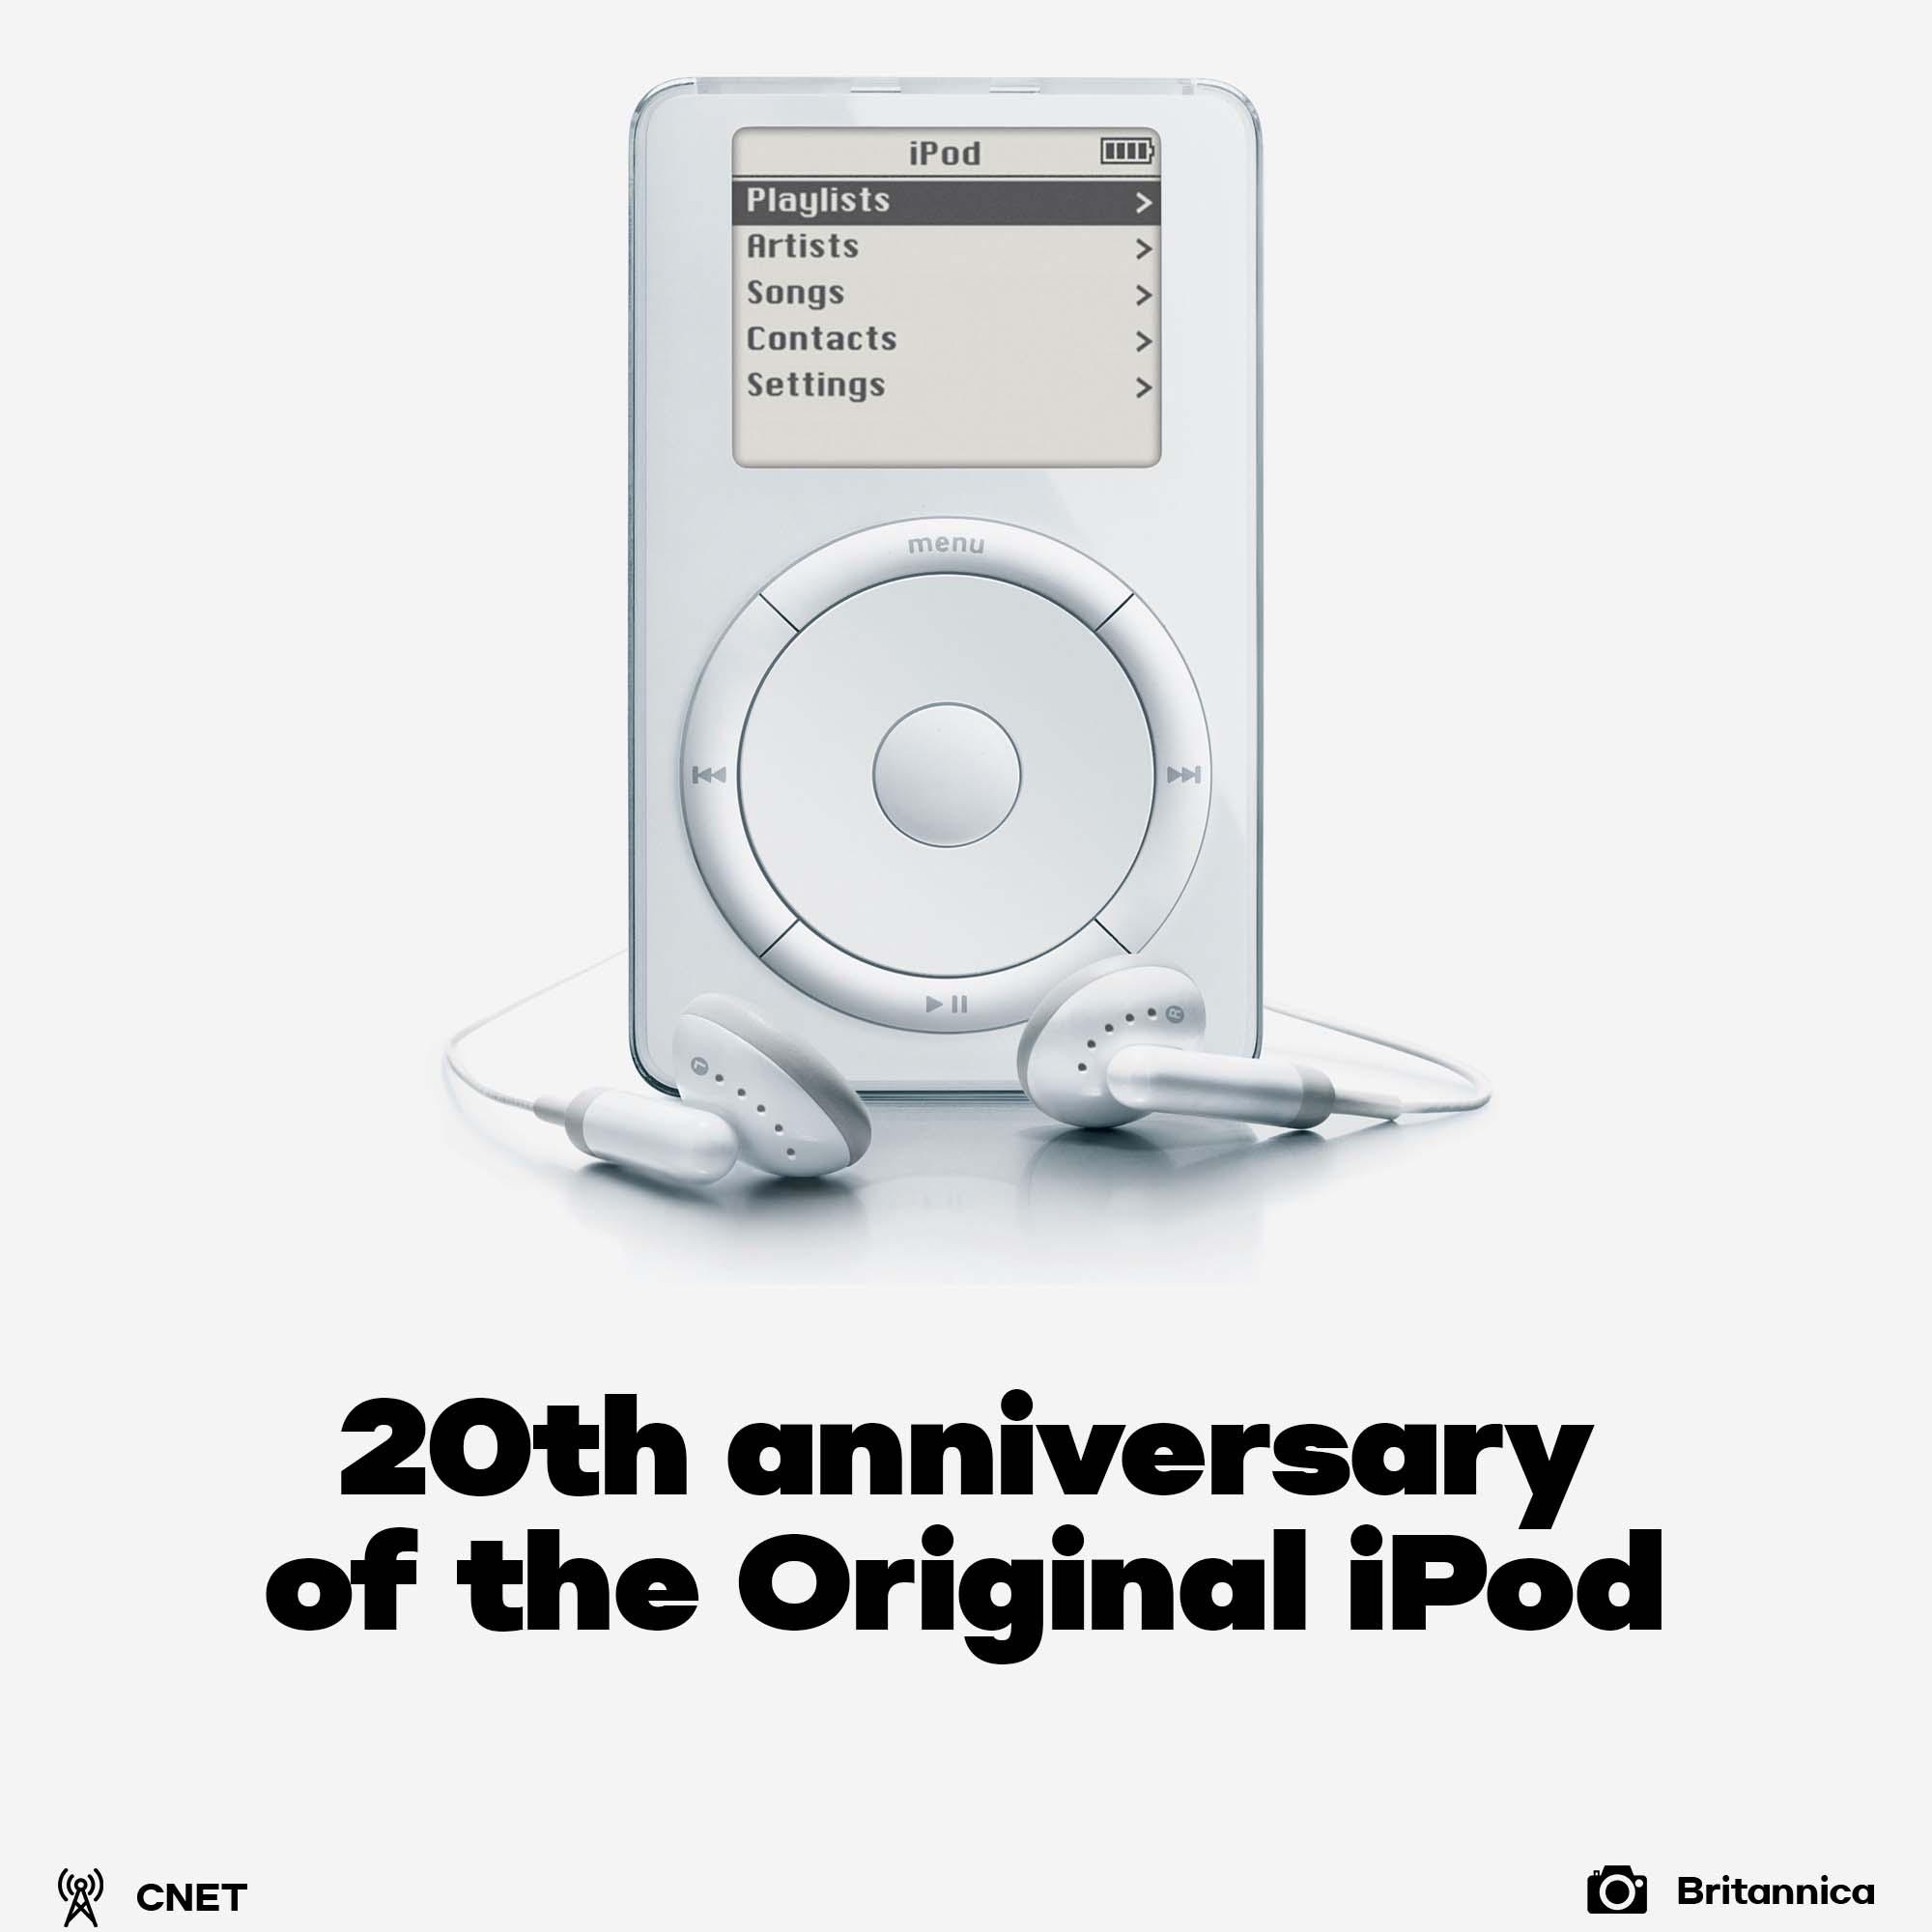 iPod 20th anniversary